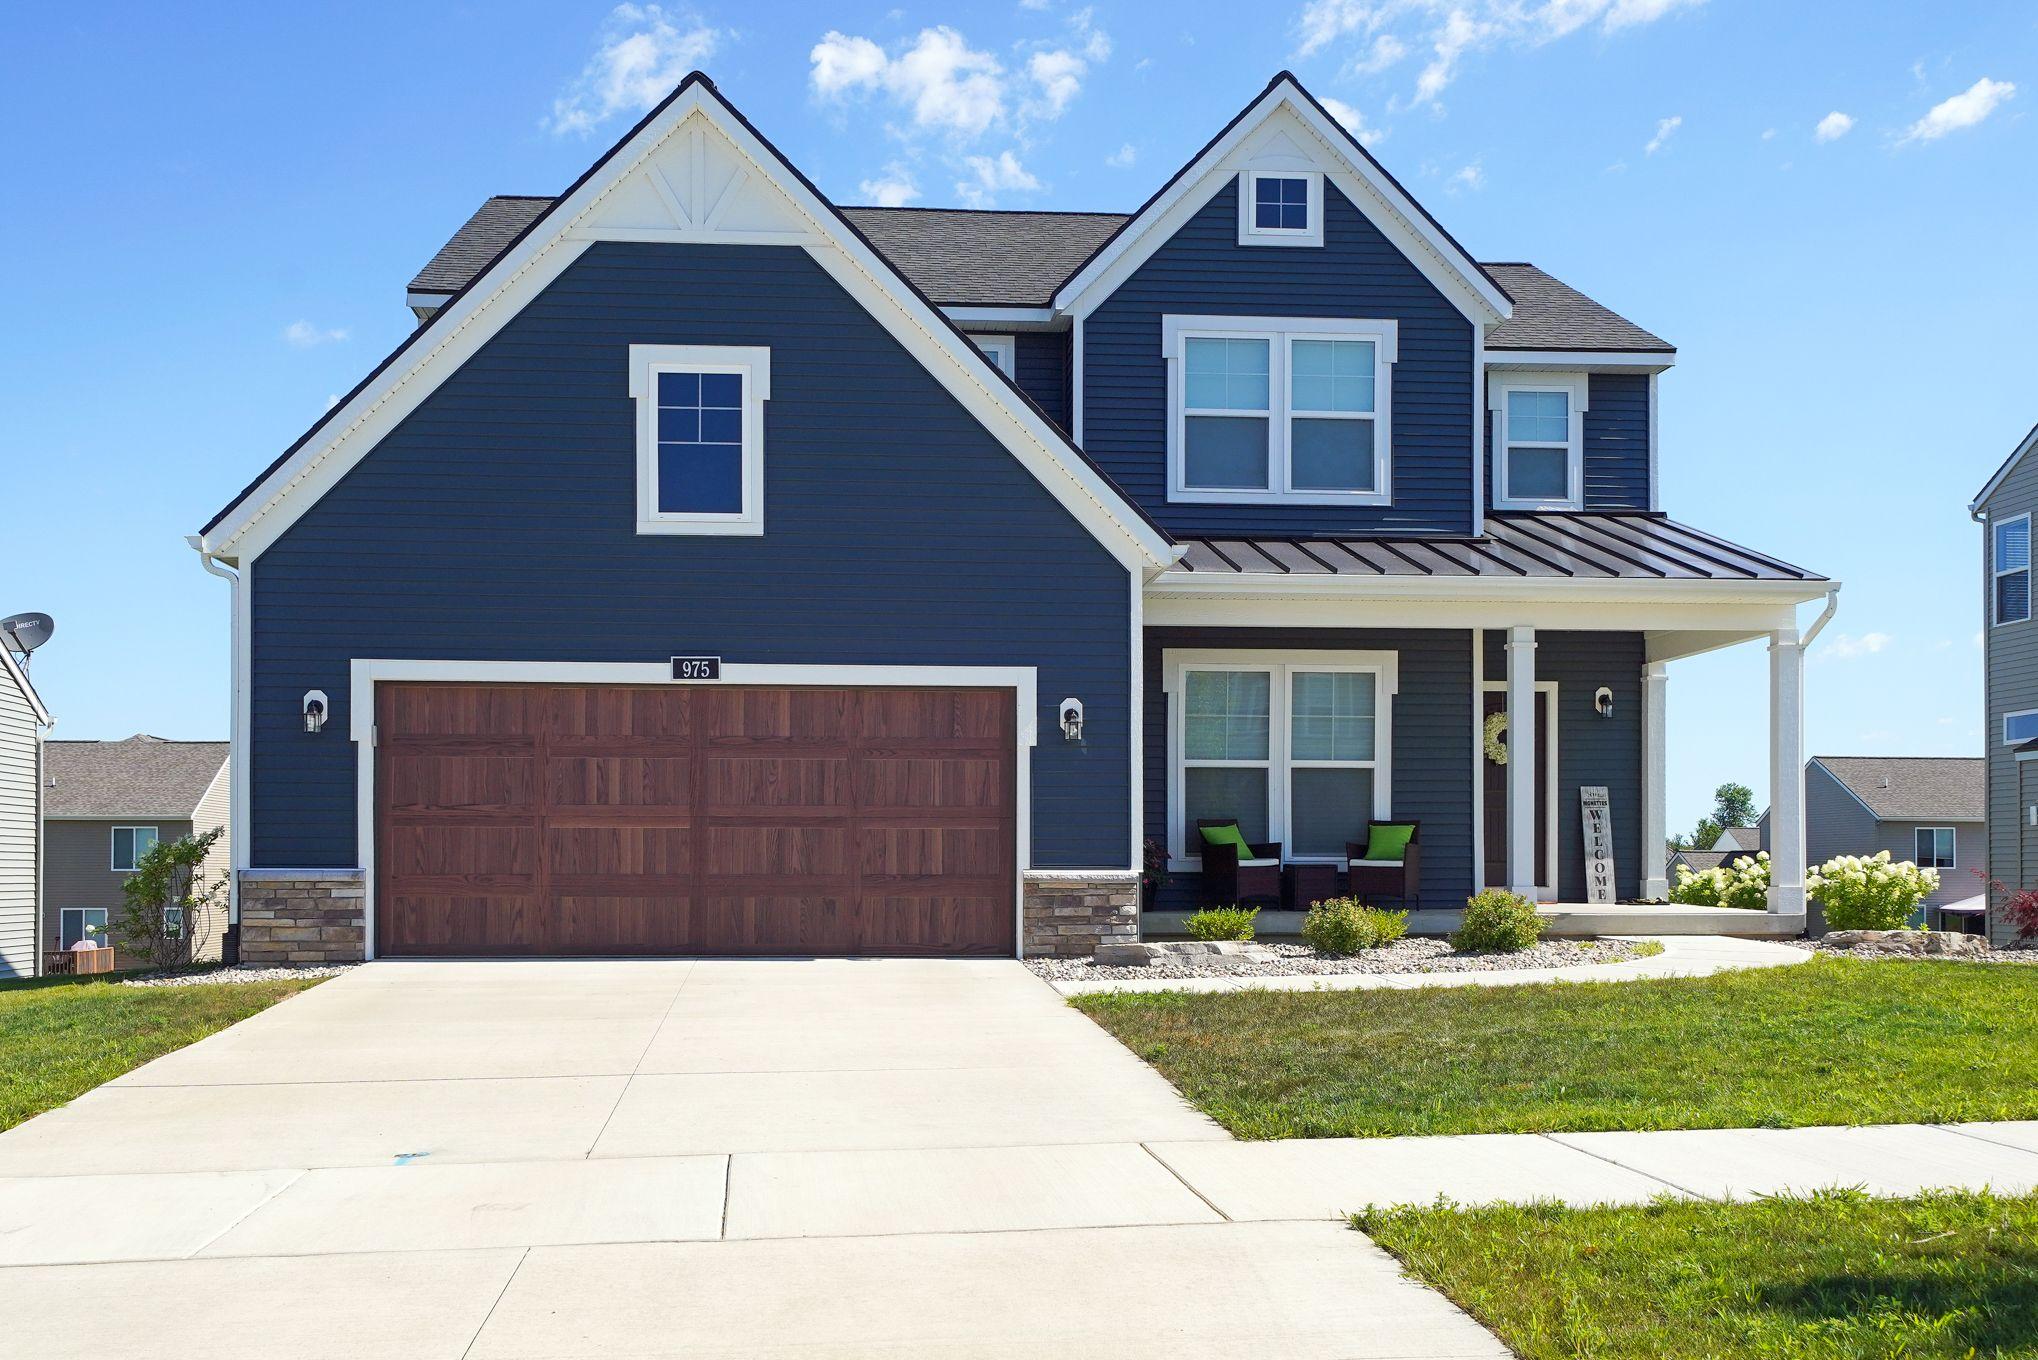 'Cook's Crossing' by Eastbrook Homes Inc. in Grand Rapids